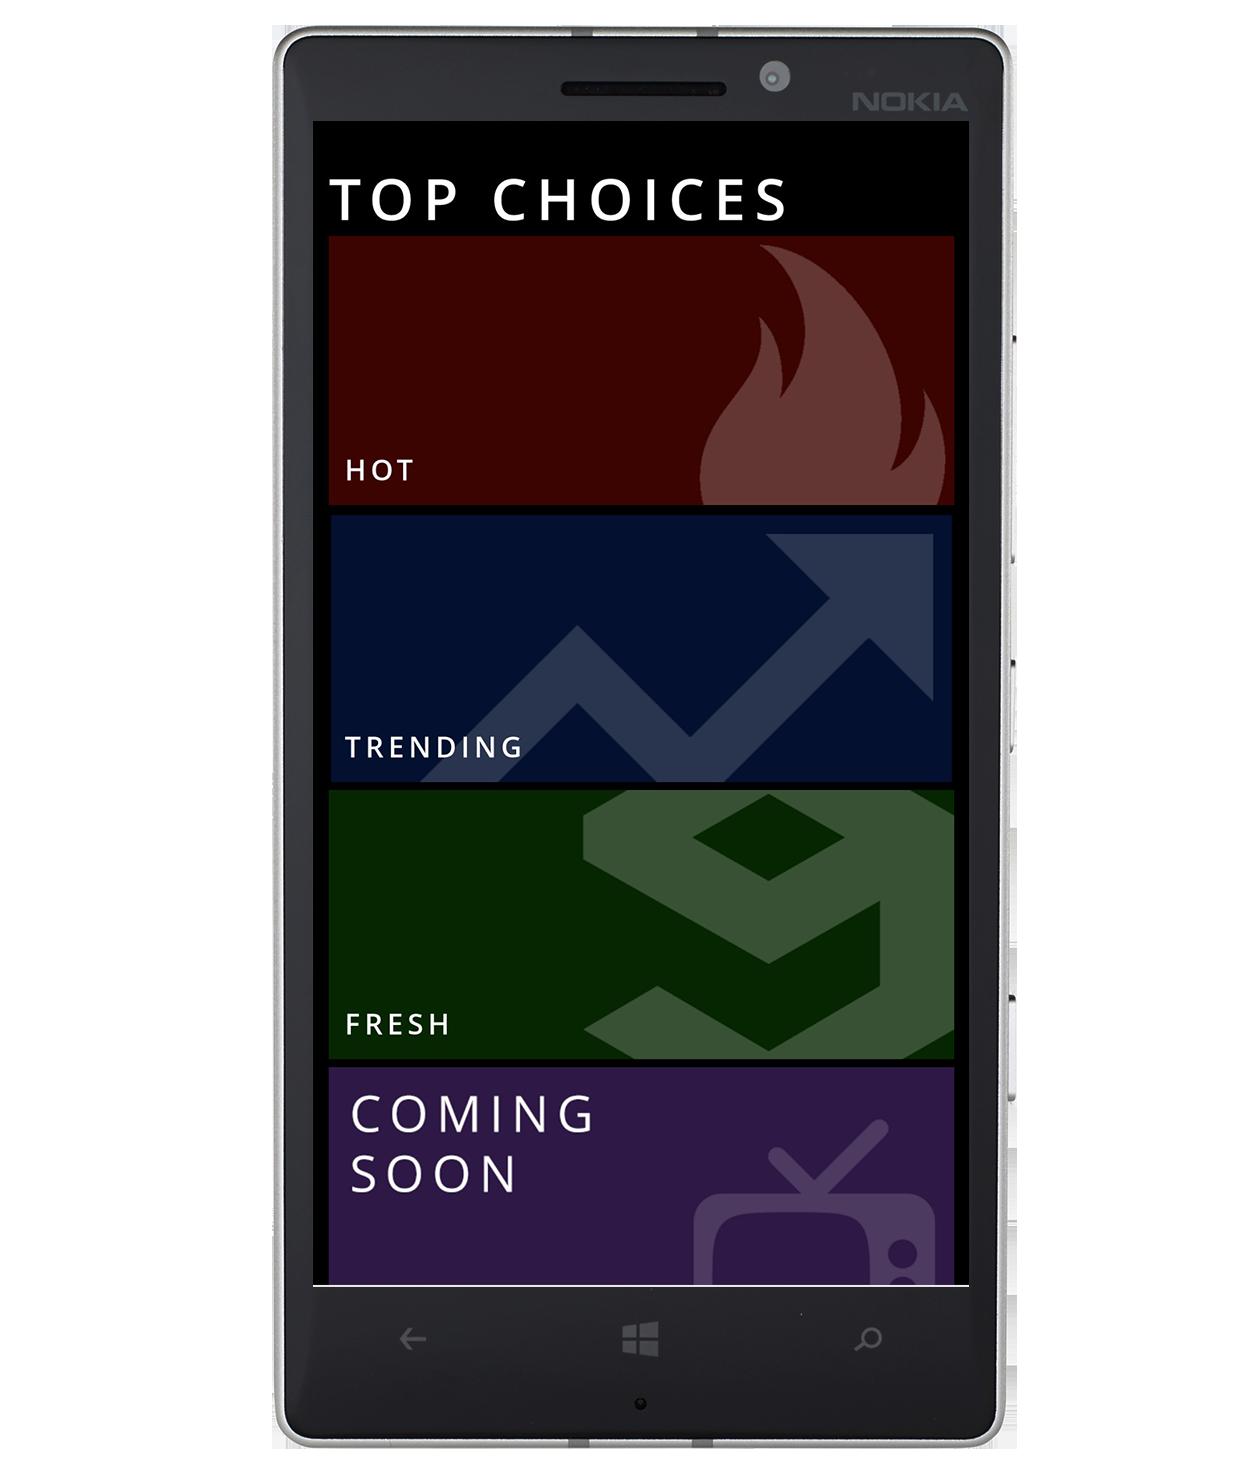 Dark themed start screen